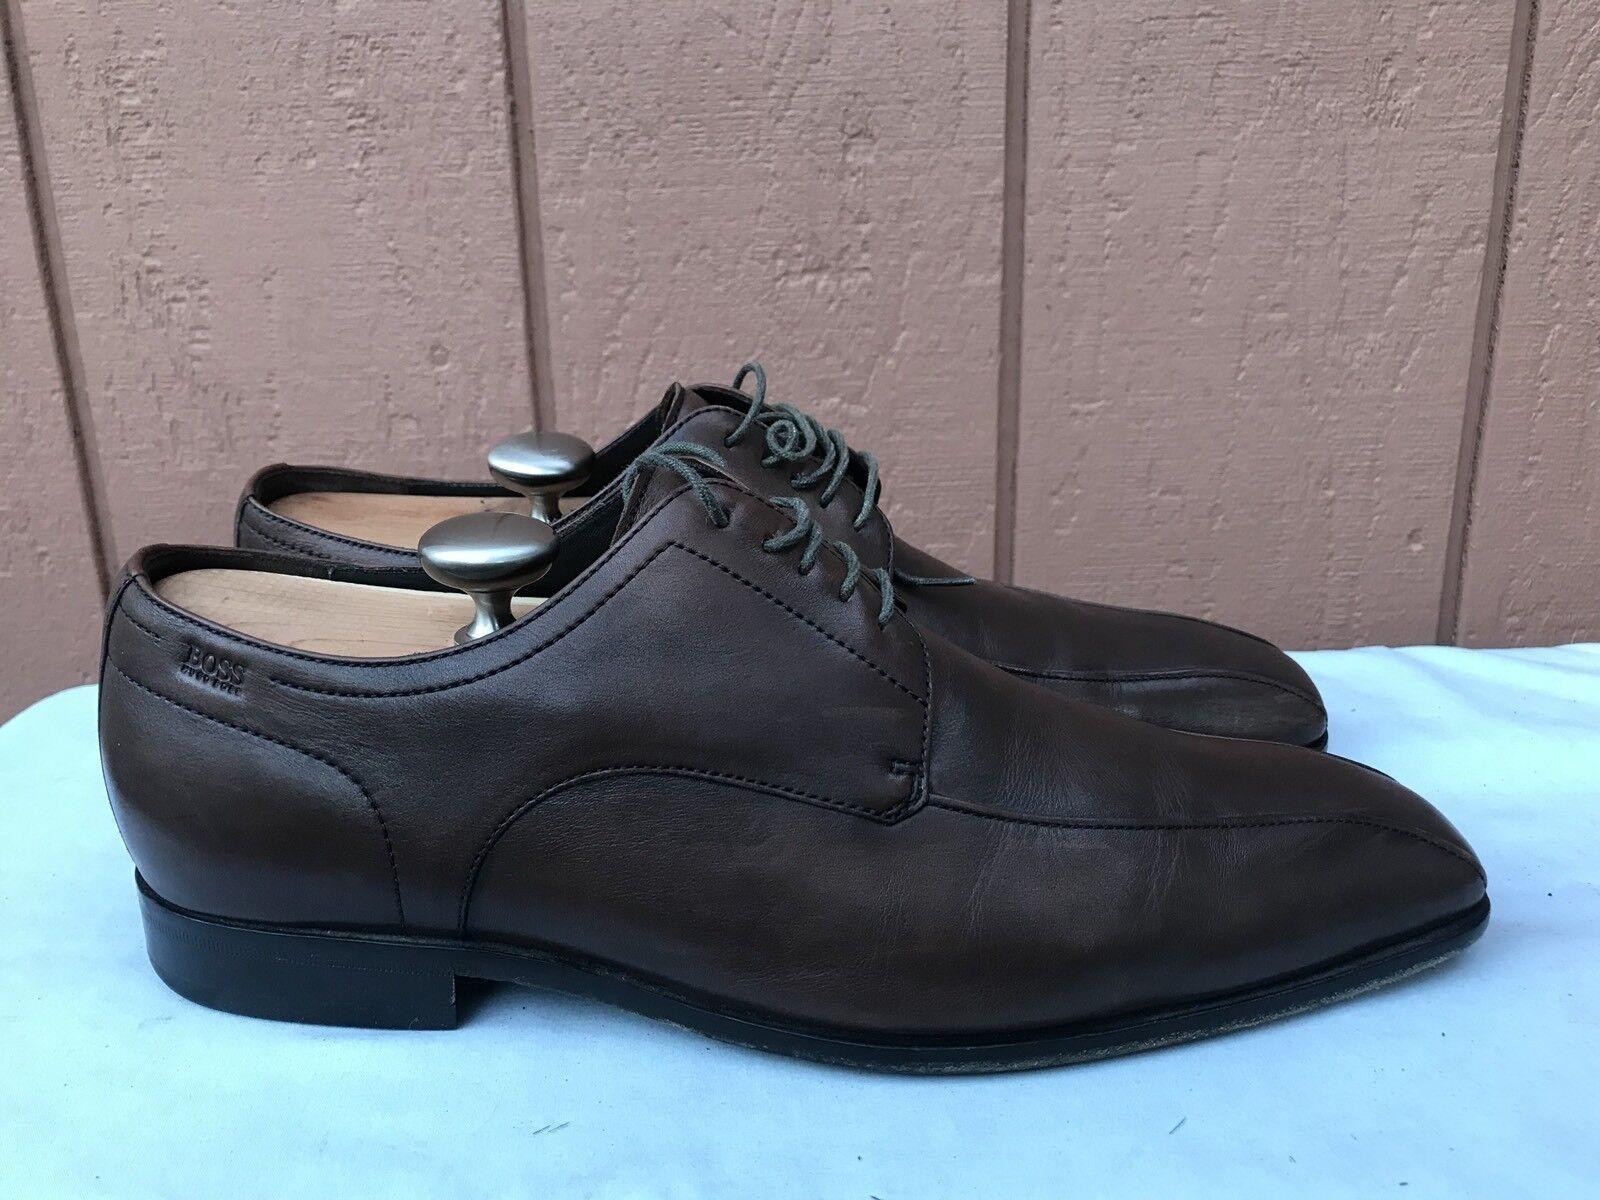 EUC HUGO BOSS Uomo US 9.5D marrone Pelle Square Toe Lace Up Dress Oxford Shoe A2